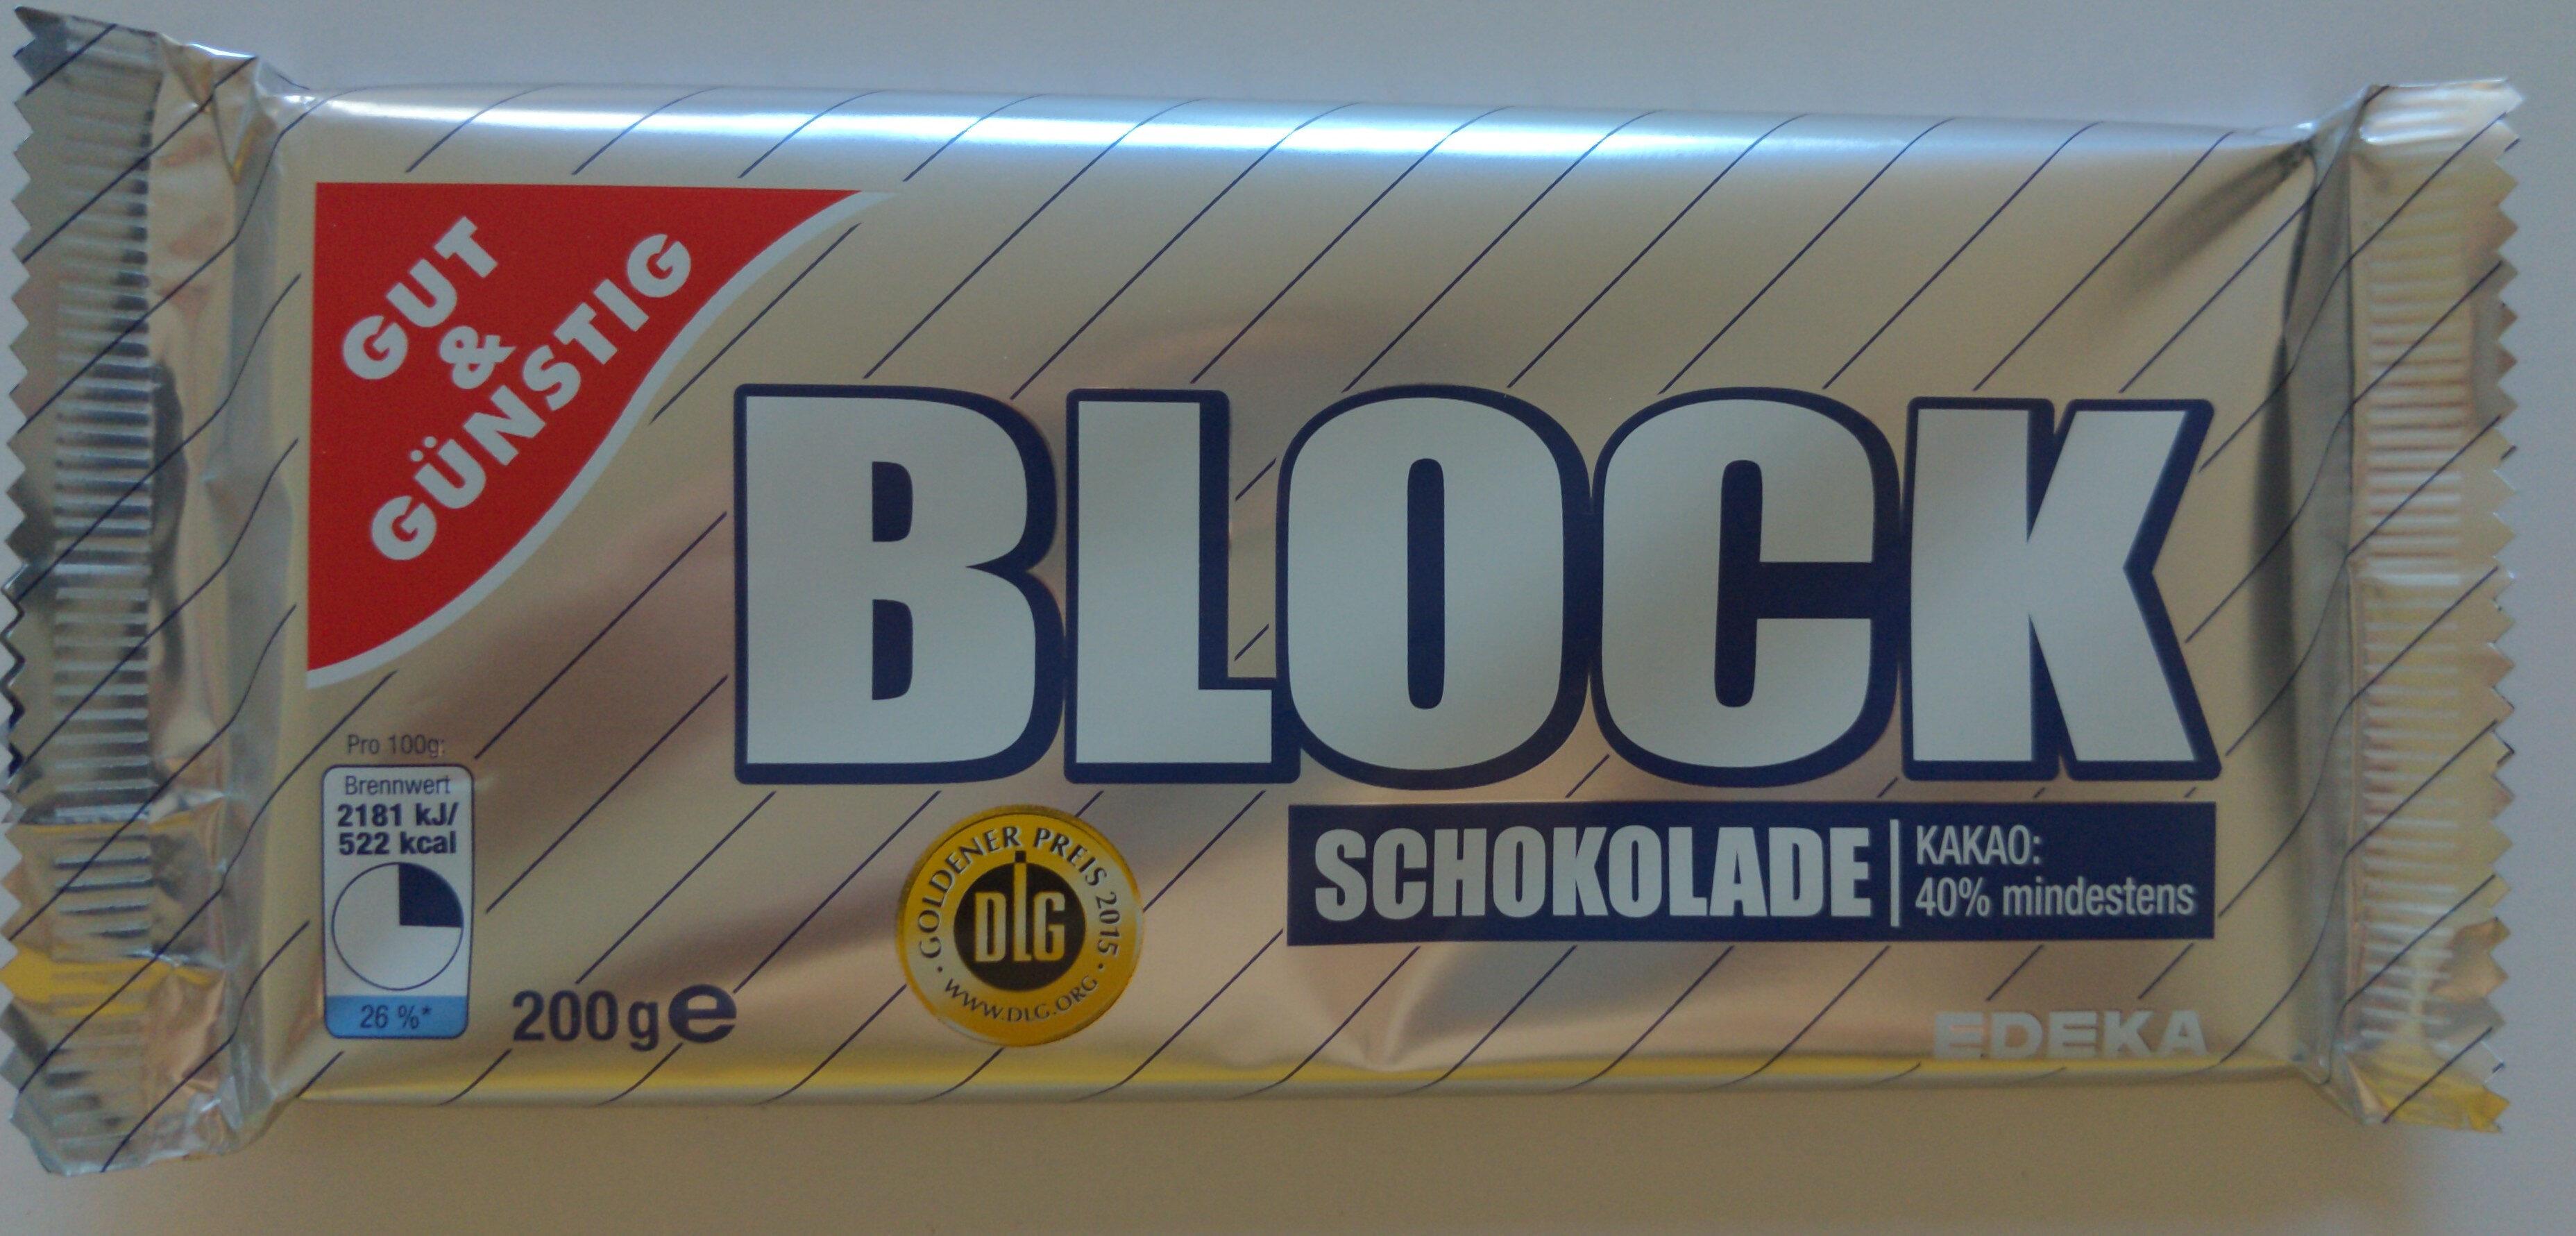 Blockschokolade - Product - de